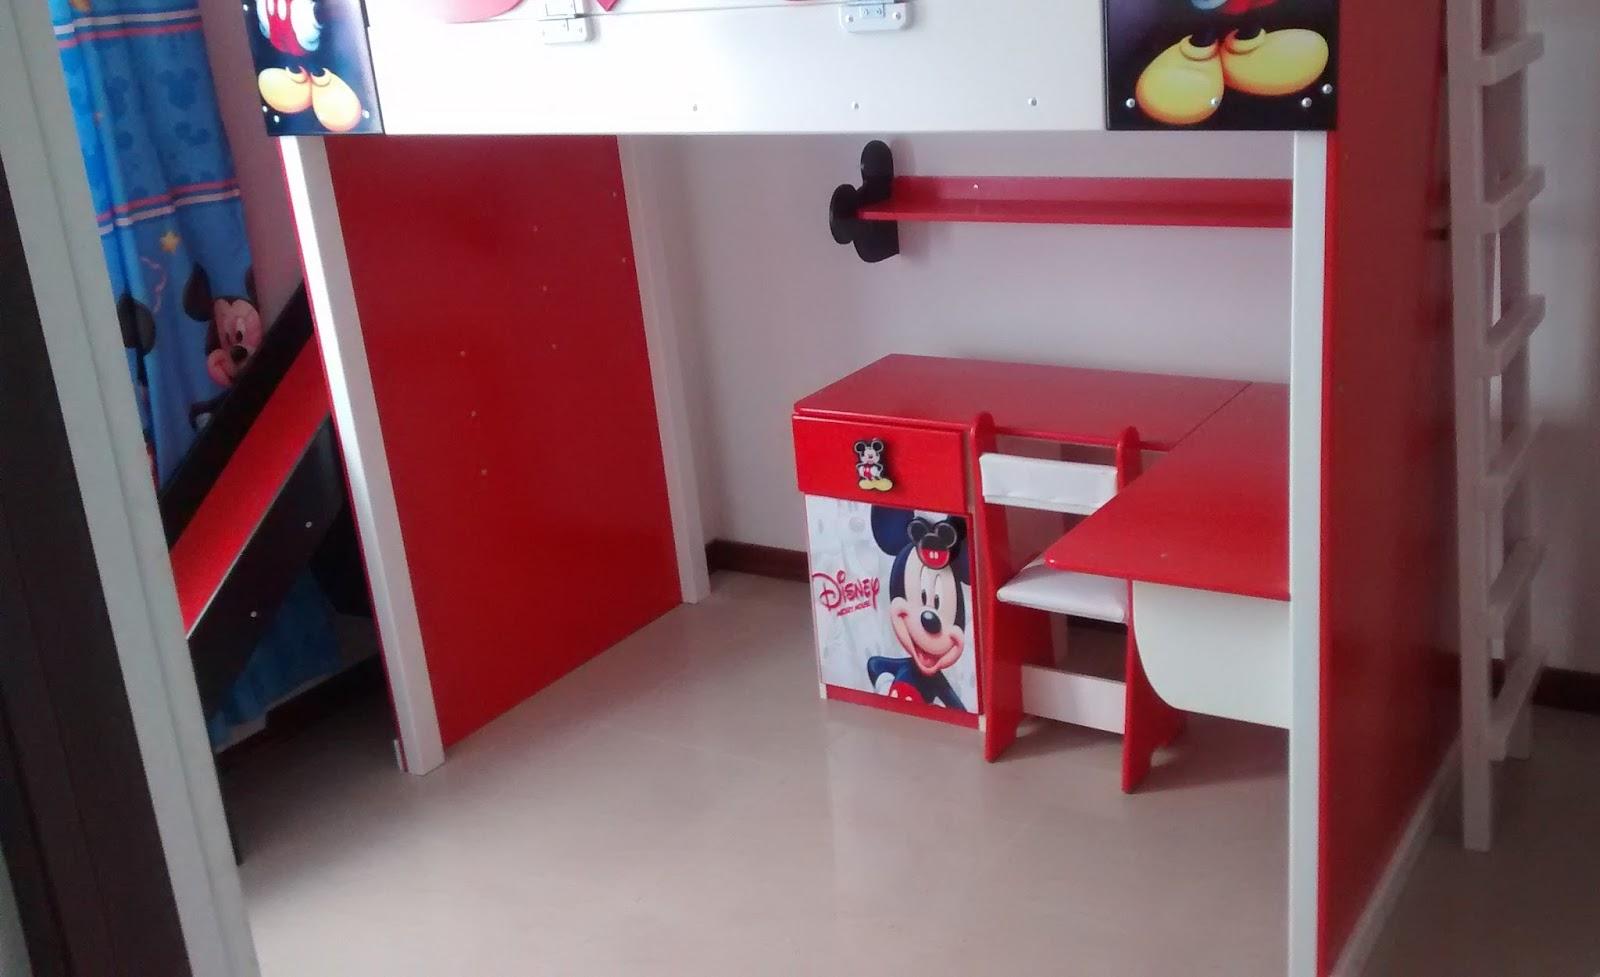 Galeria arte y dise o madekids set habitacion infantil - Diseno habitacion infantil ...